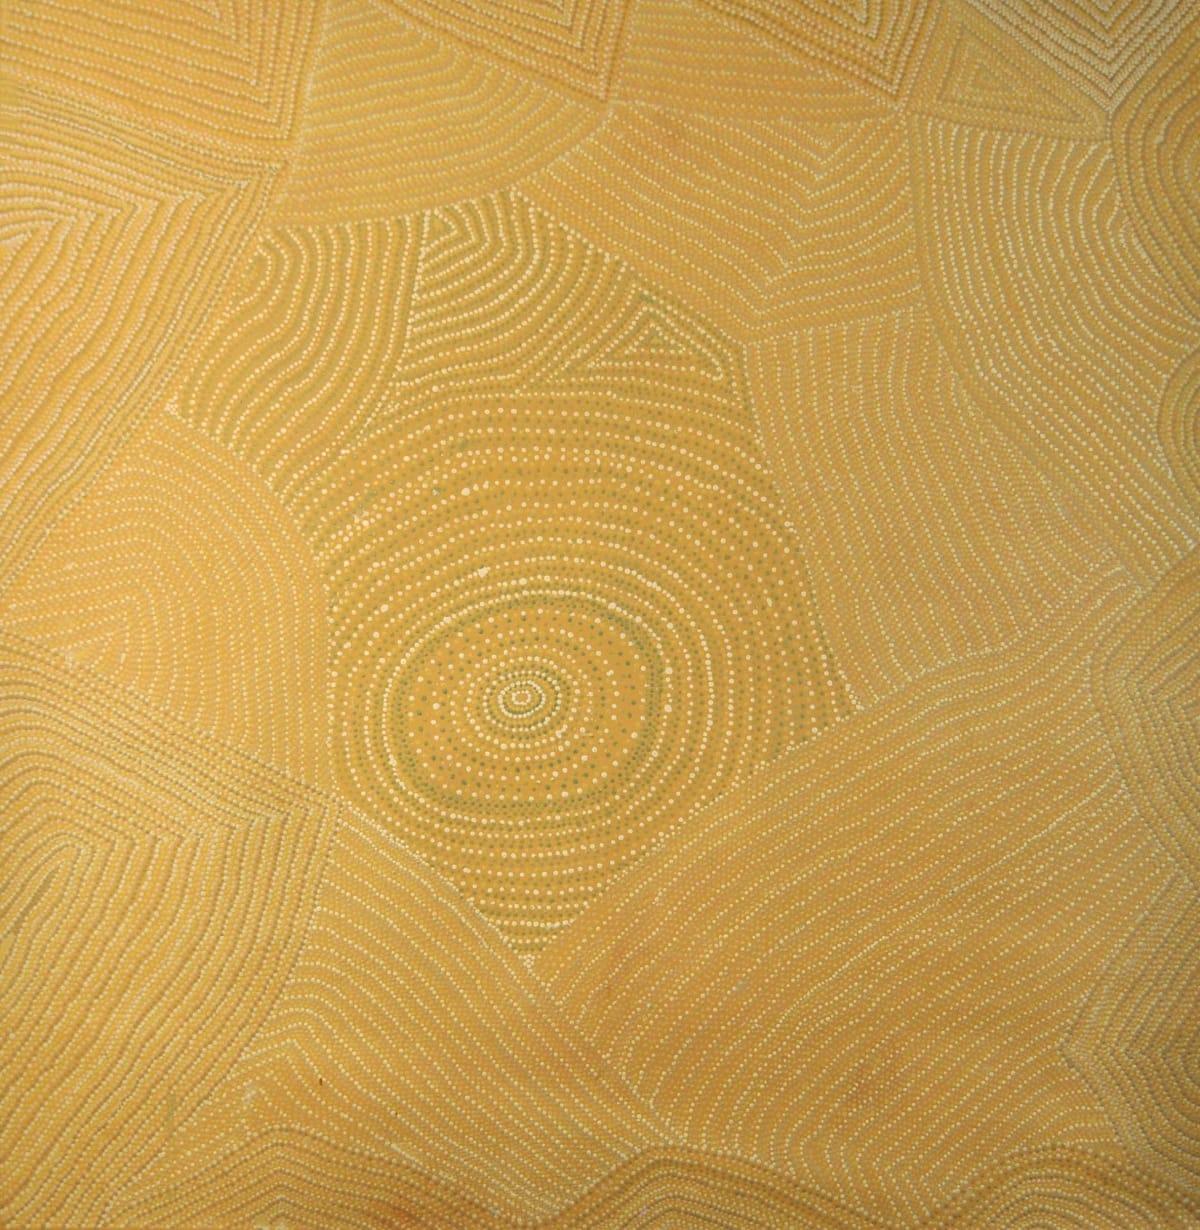 Pepai Jangala Carroll Walungurru acrylic on canvas 180 x 170 cm